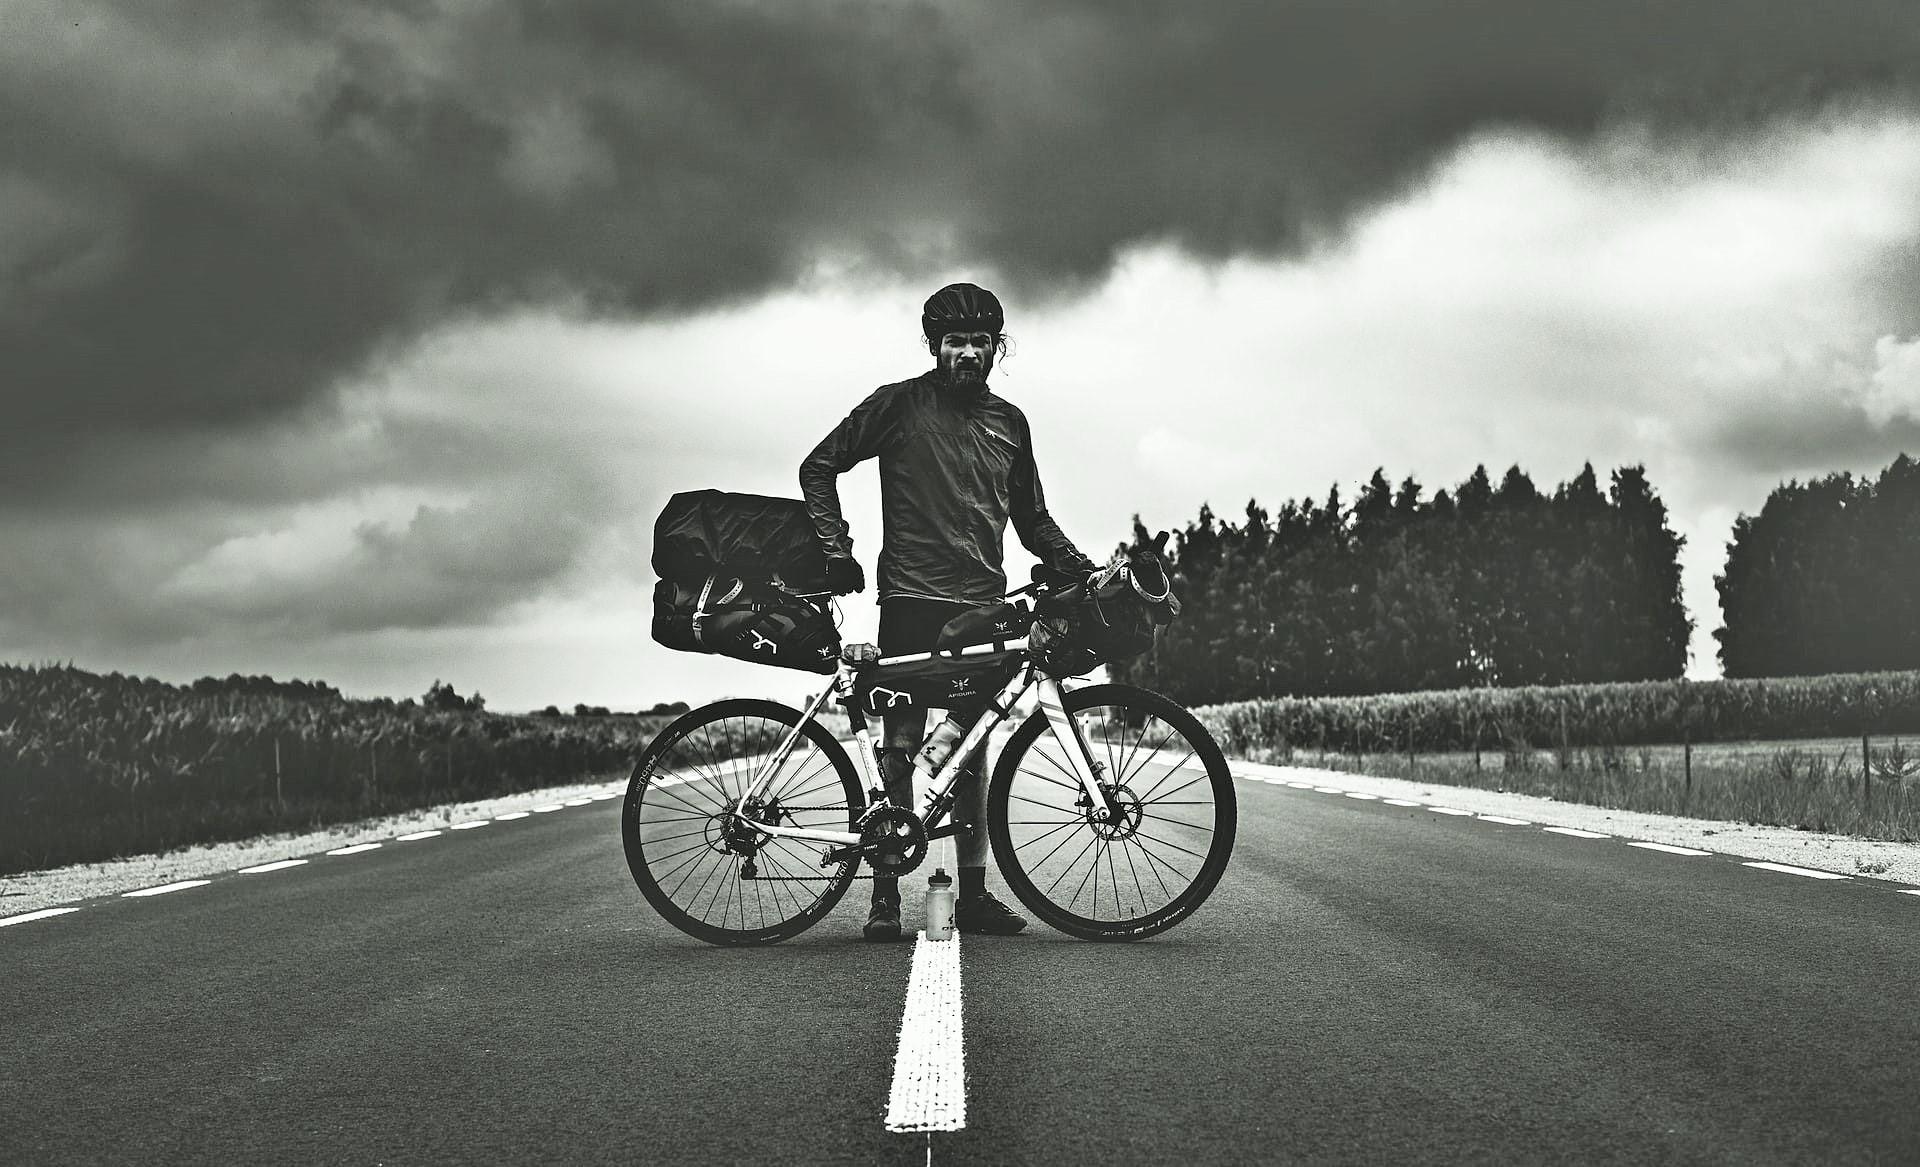 Tι είναι τo bikepacking και γιατί πολλοί δεν το γνωρίζουν